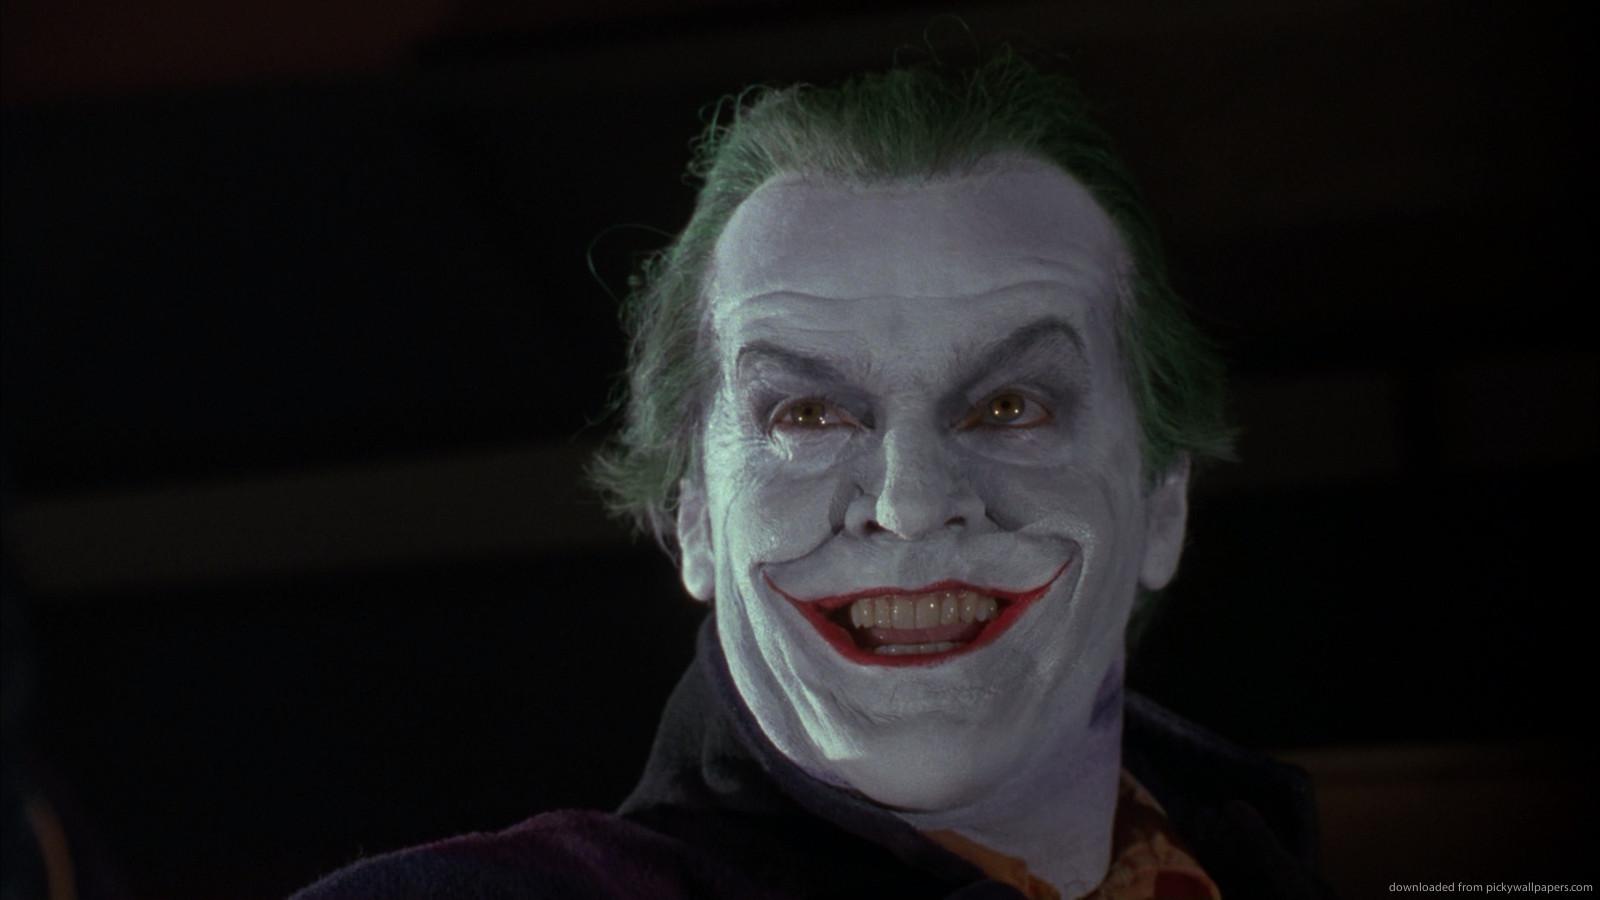 Download 1600x900 Jack Nicholson As A Joker Wallpaper 1600x900